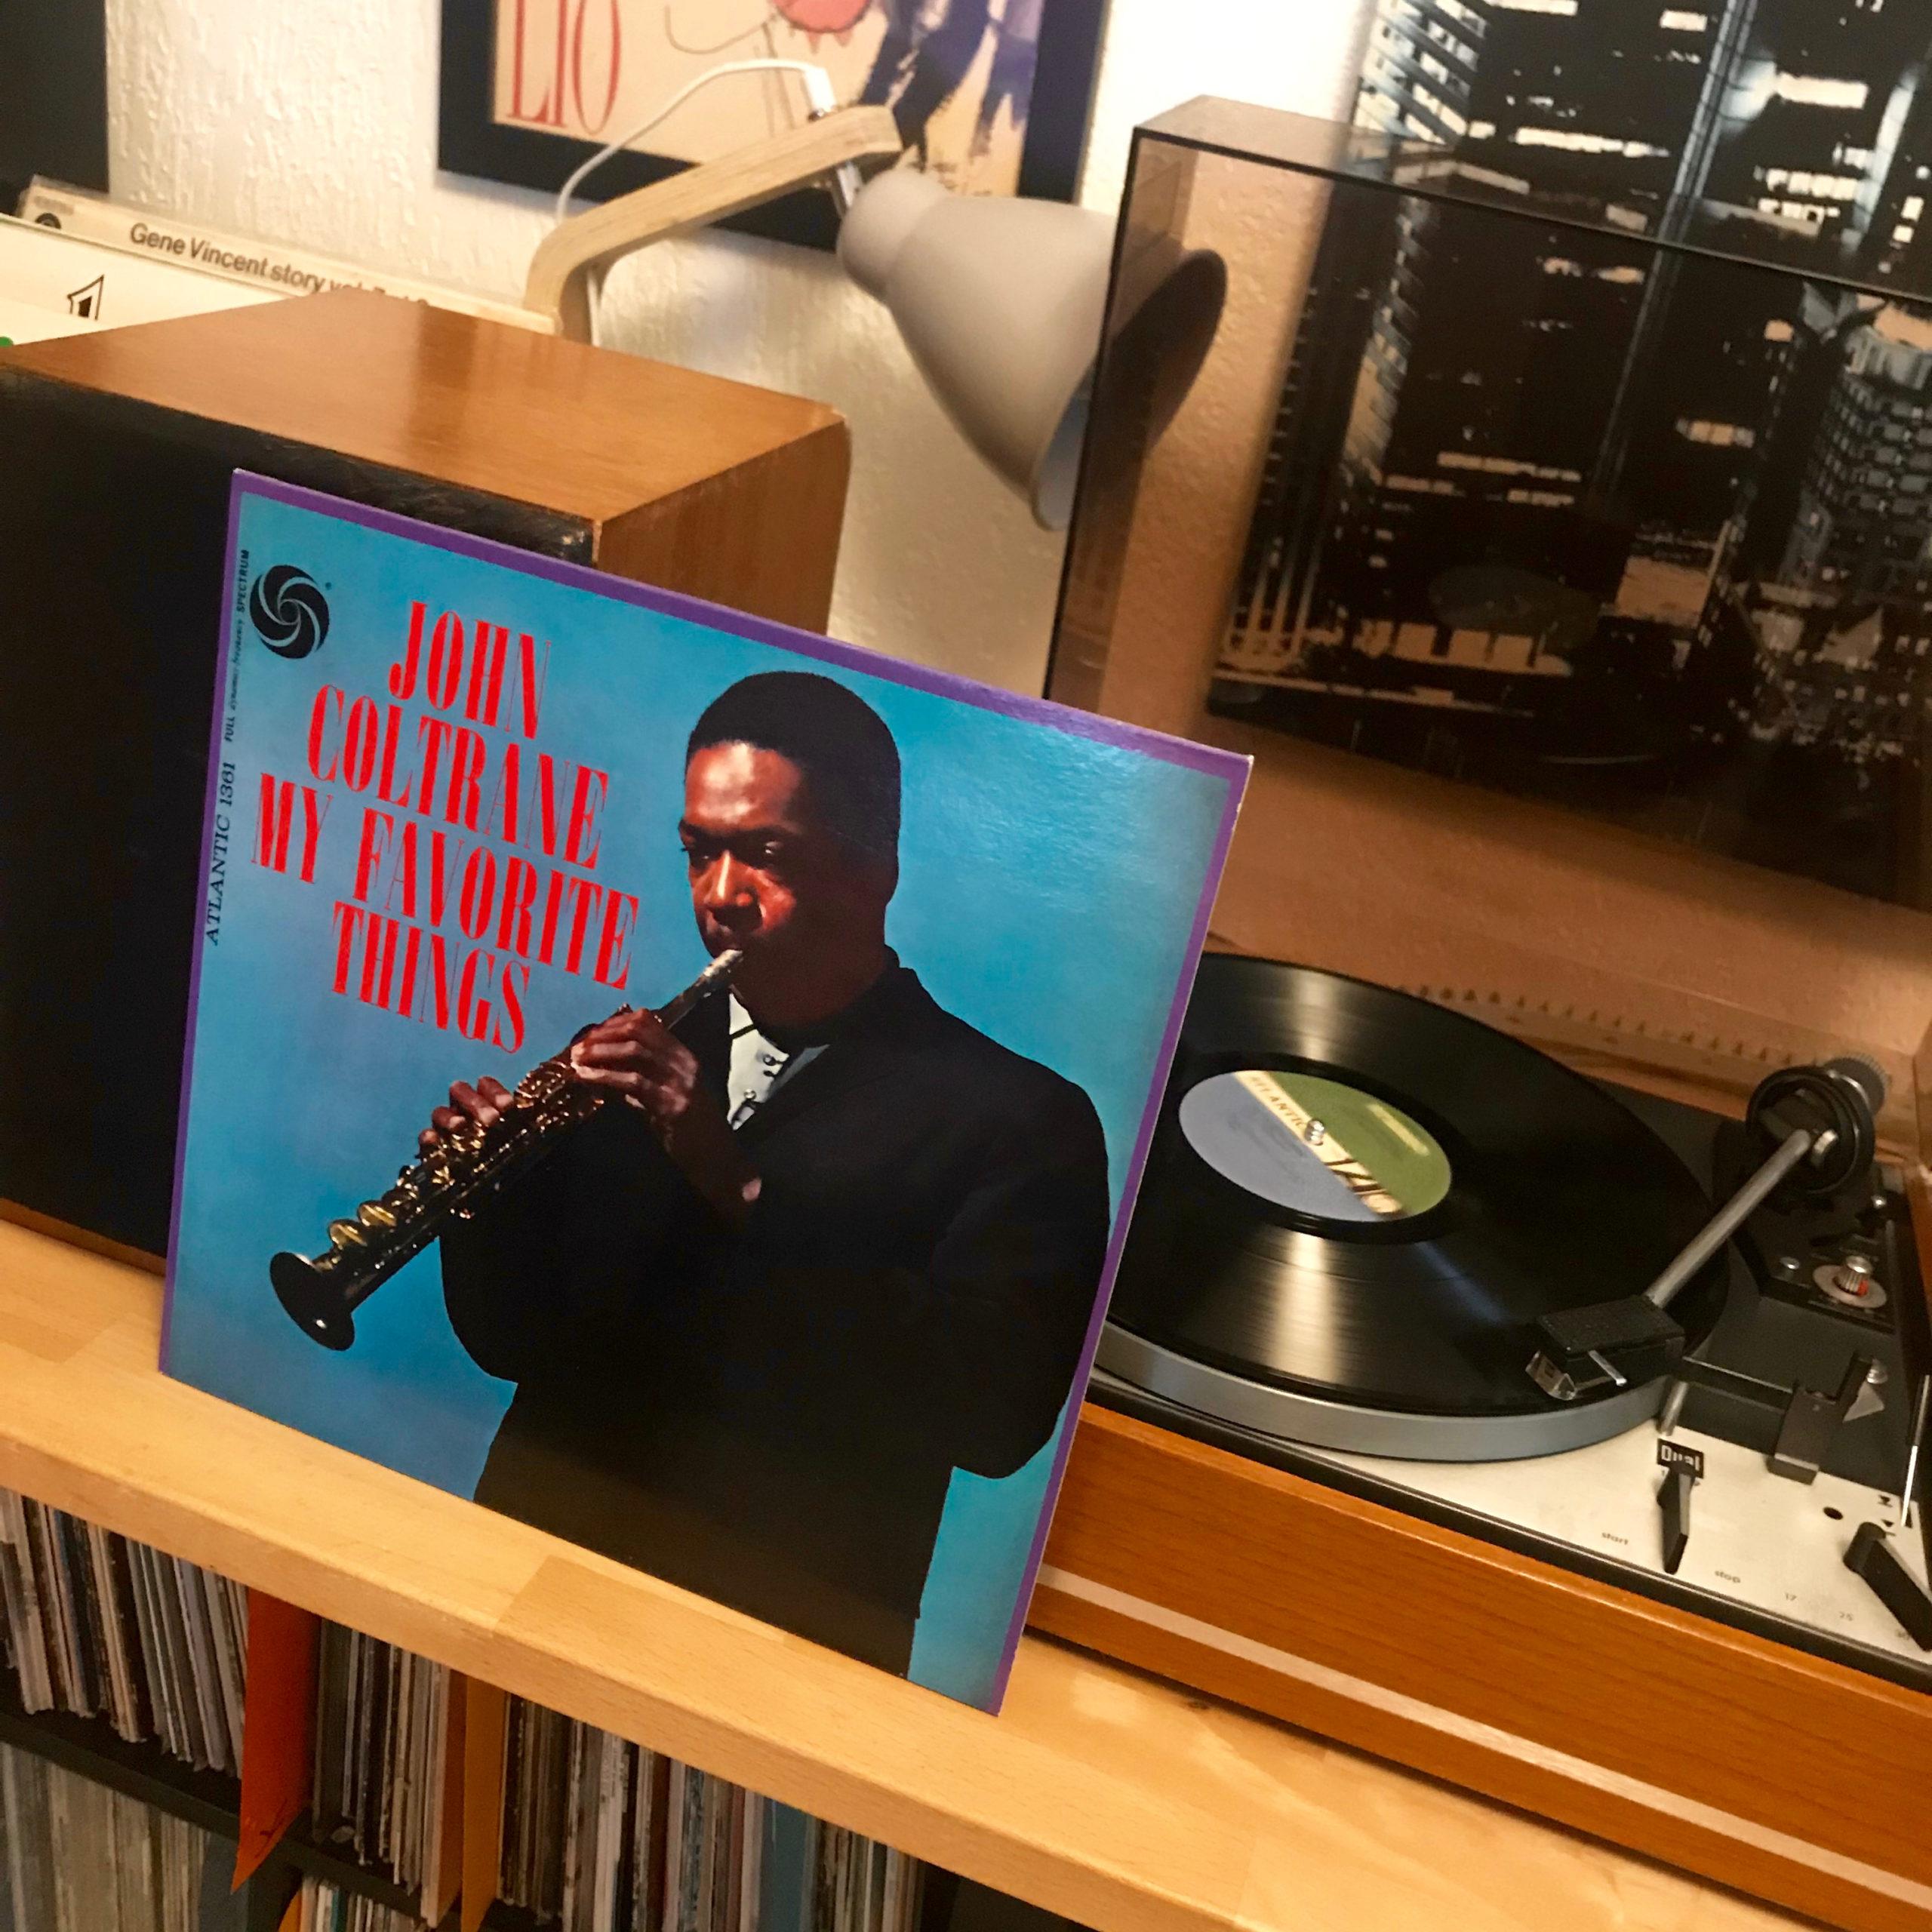 Jour 13 – Coltrane !